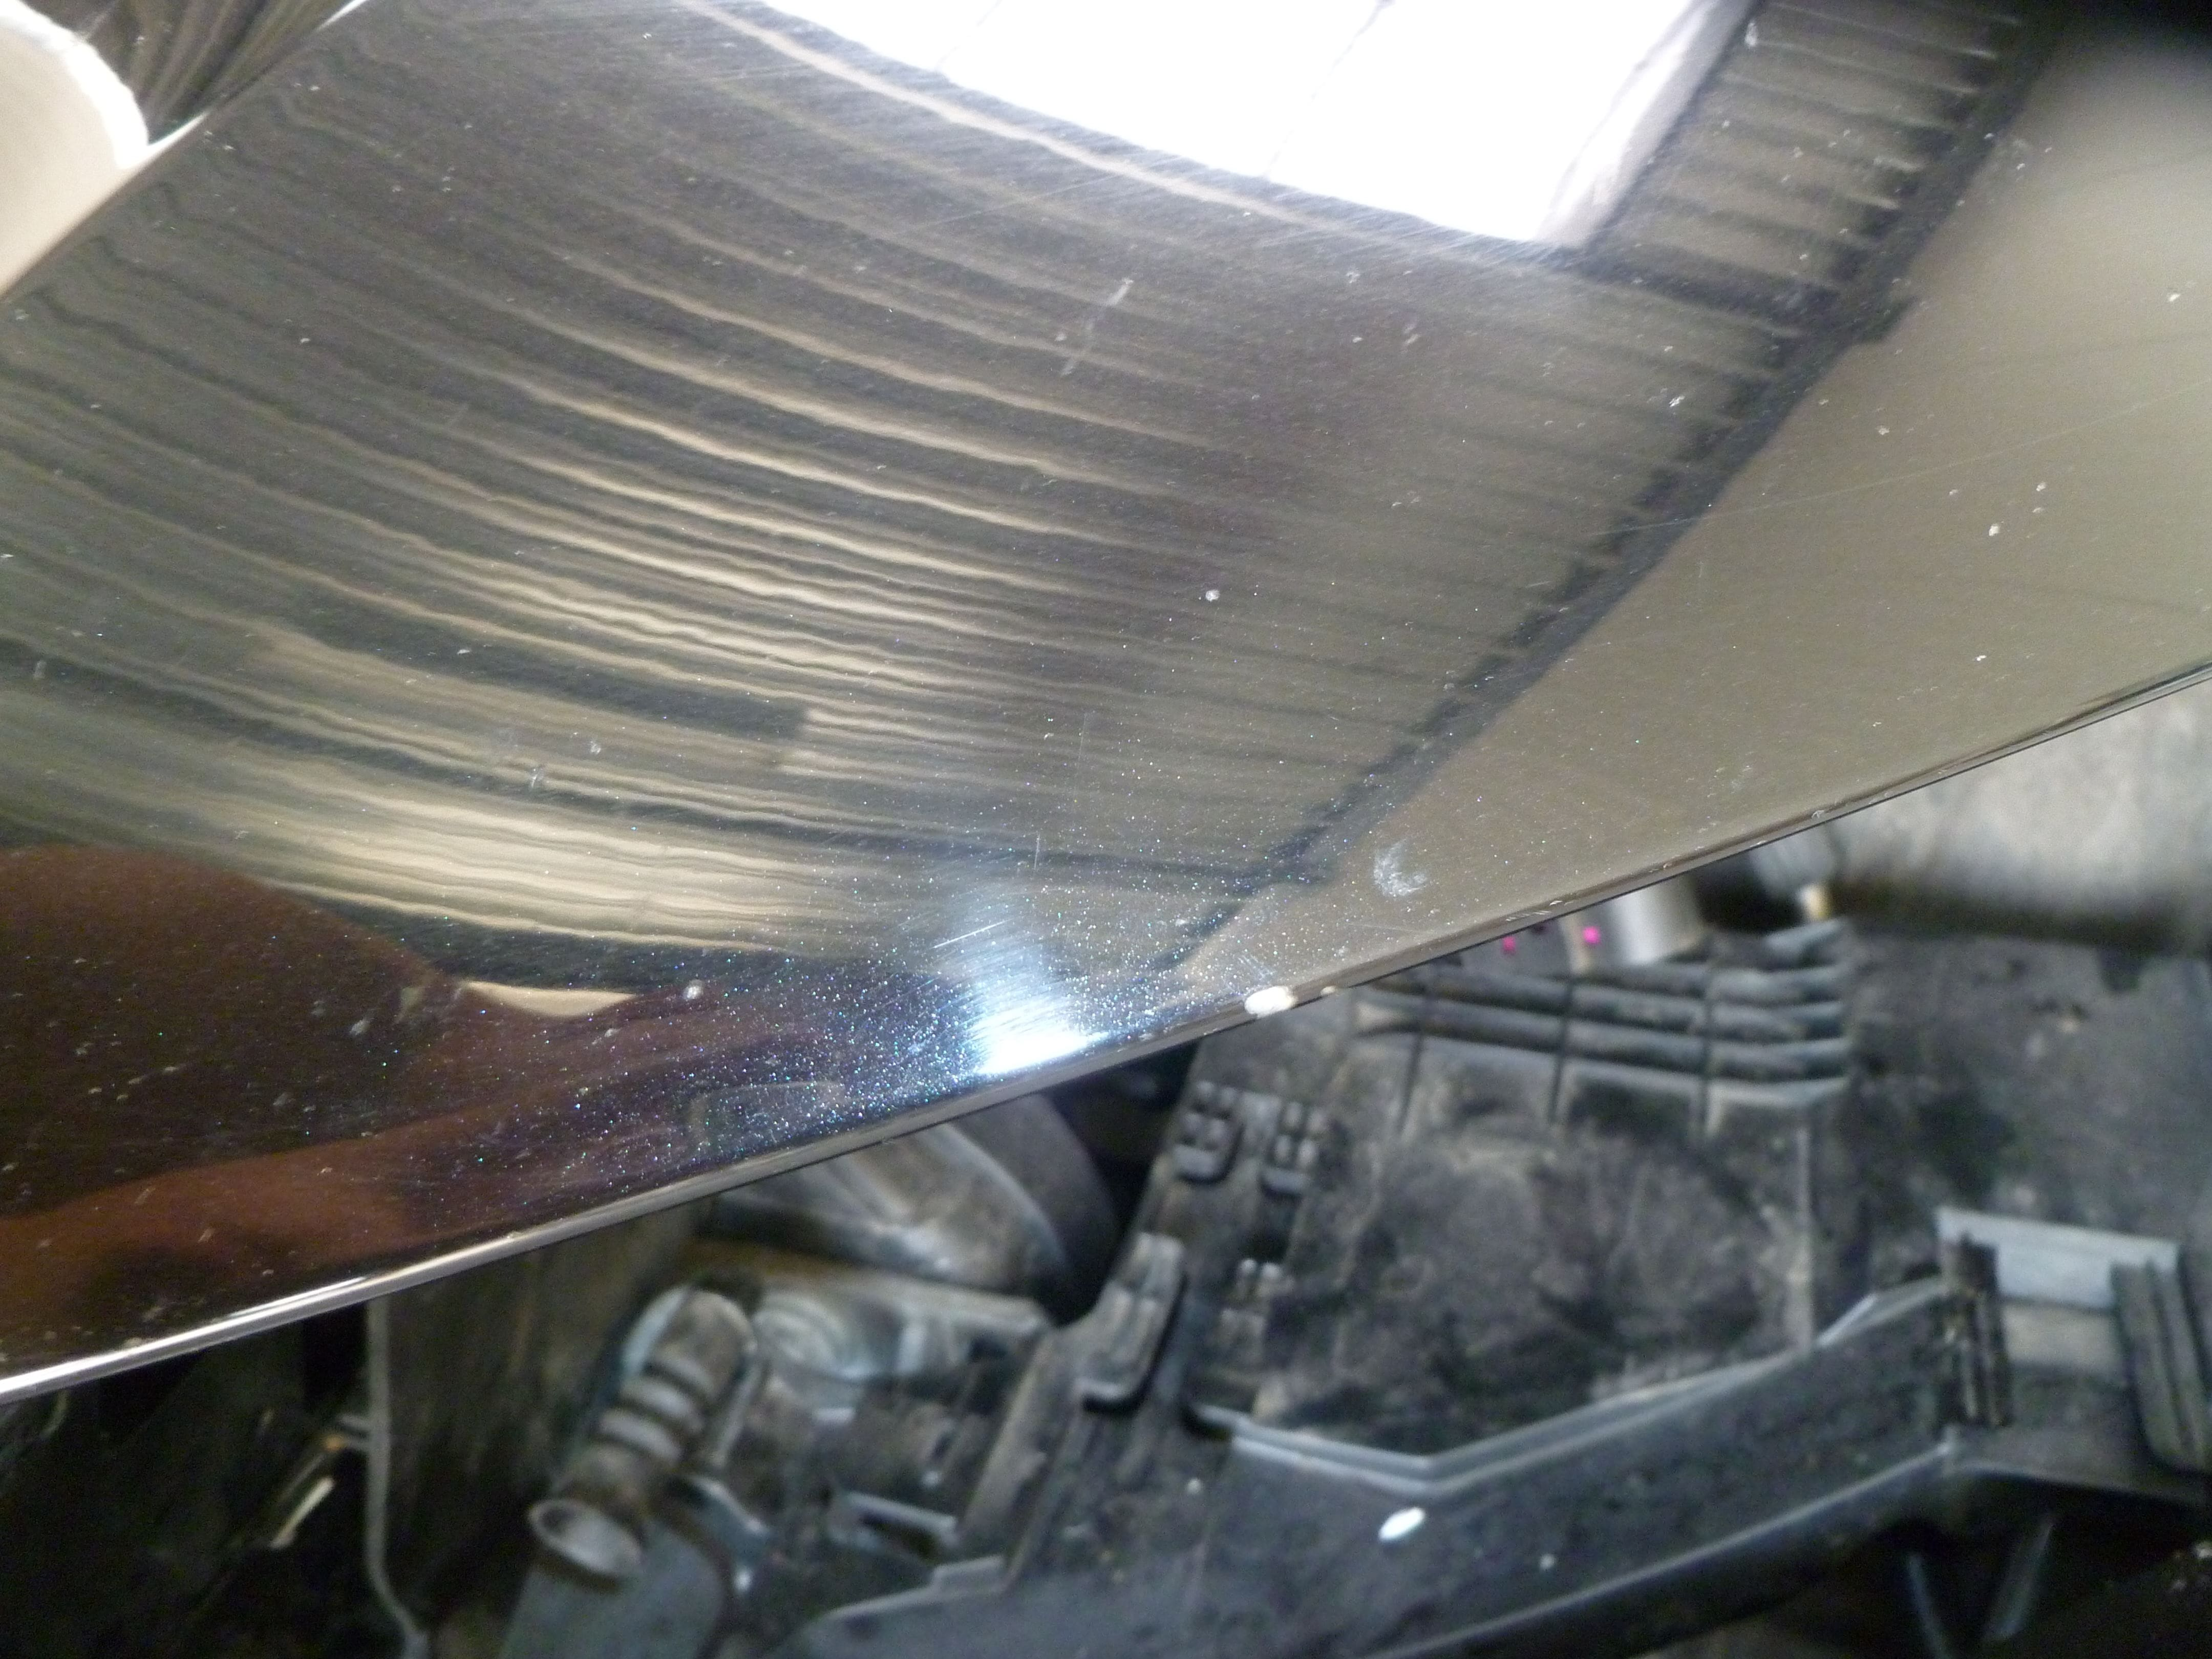 Audi A5 coupe met Metallic Witte Wrap, Carwrapping door Wrapmyride.nu Foto-nr:4687, ©2021